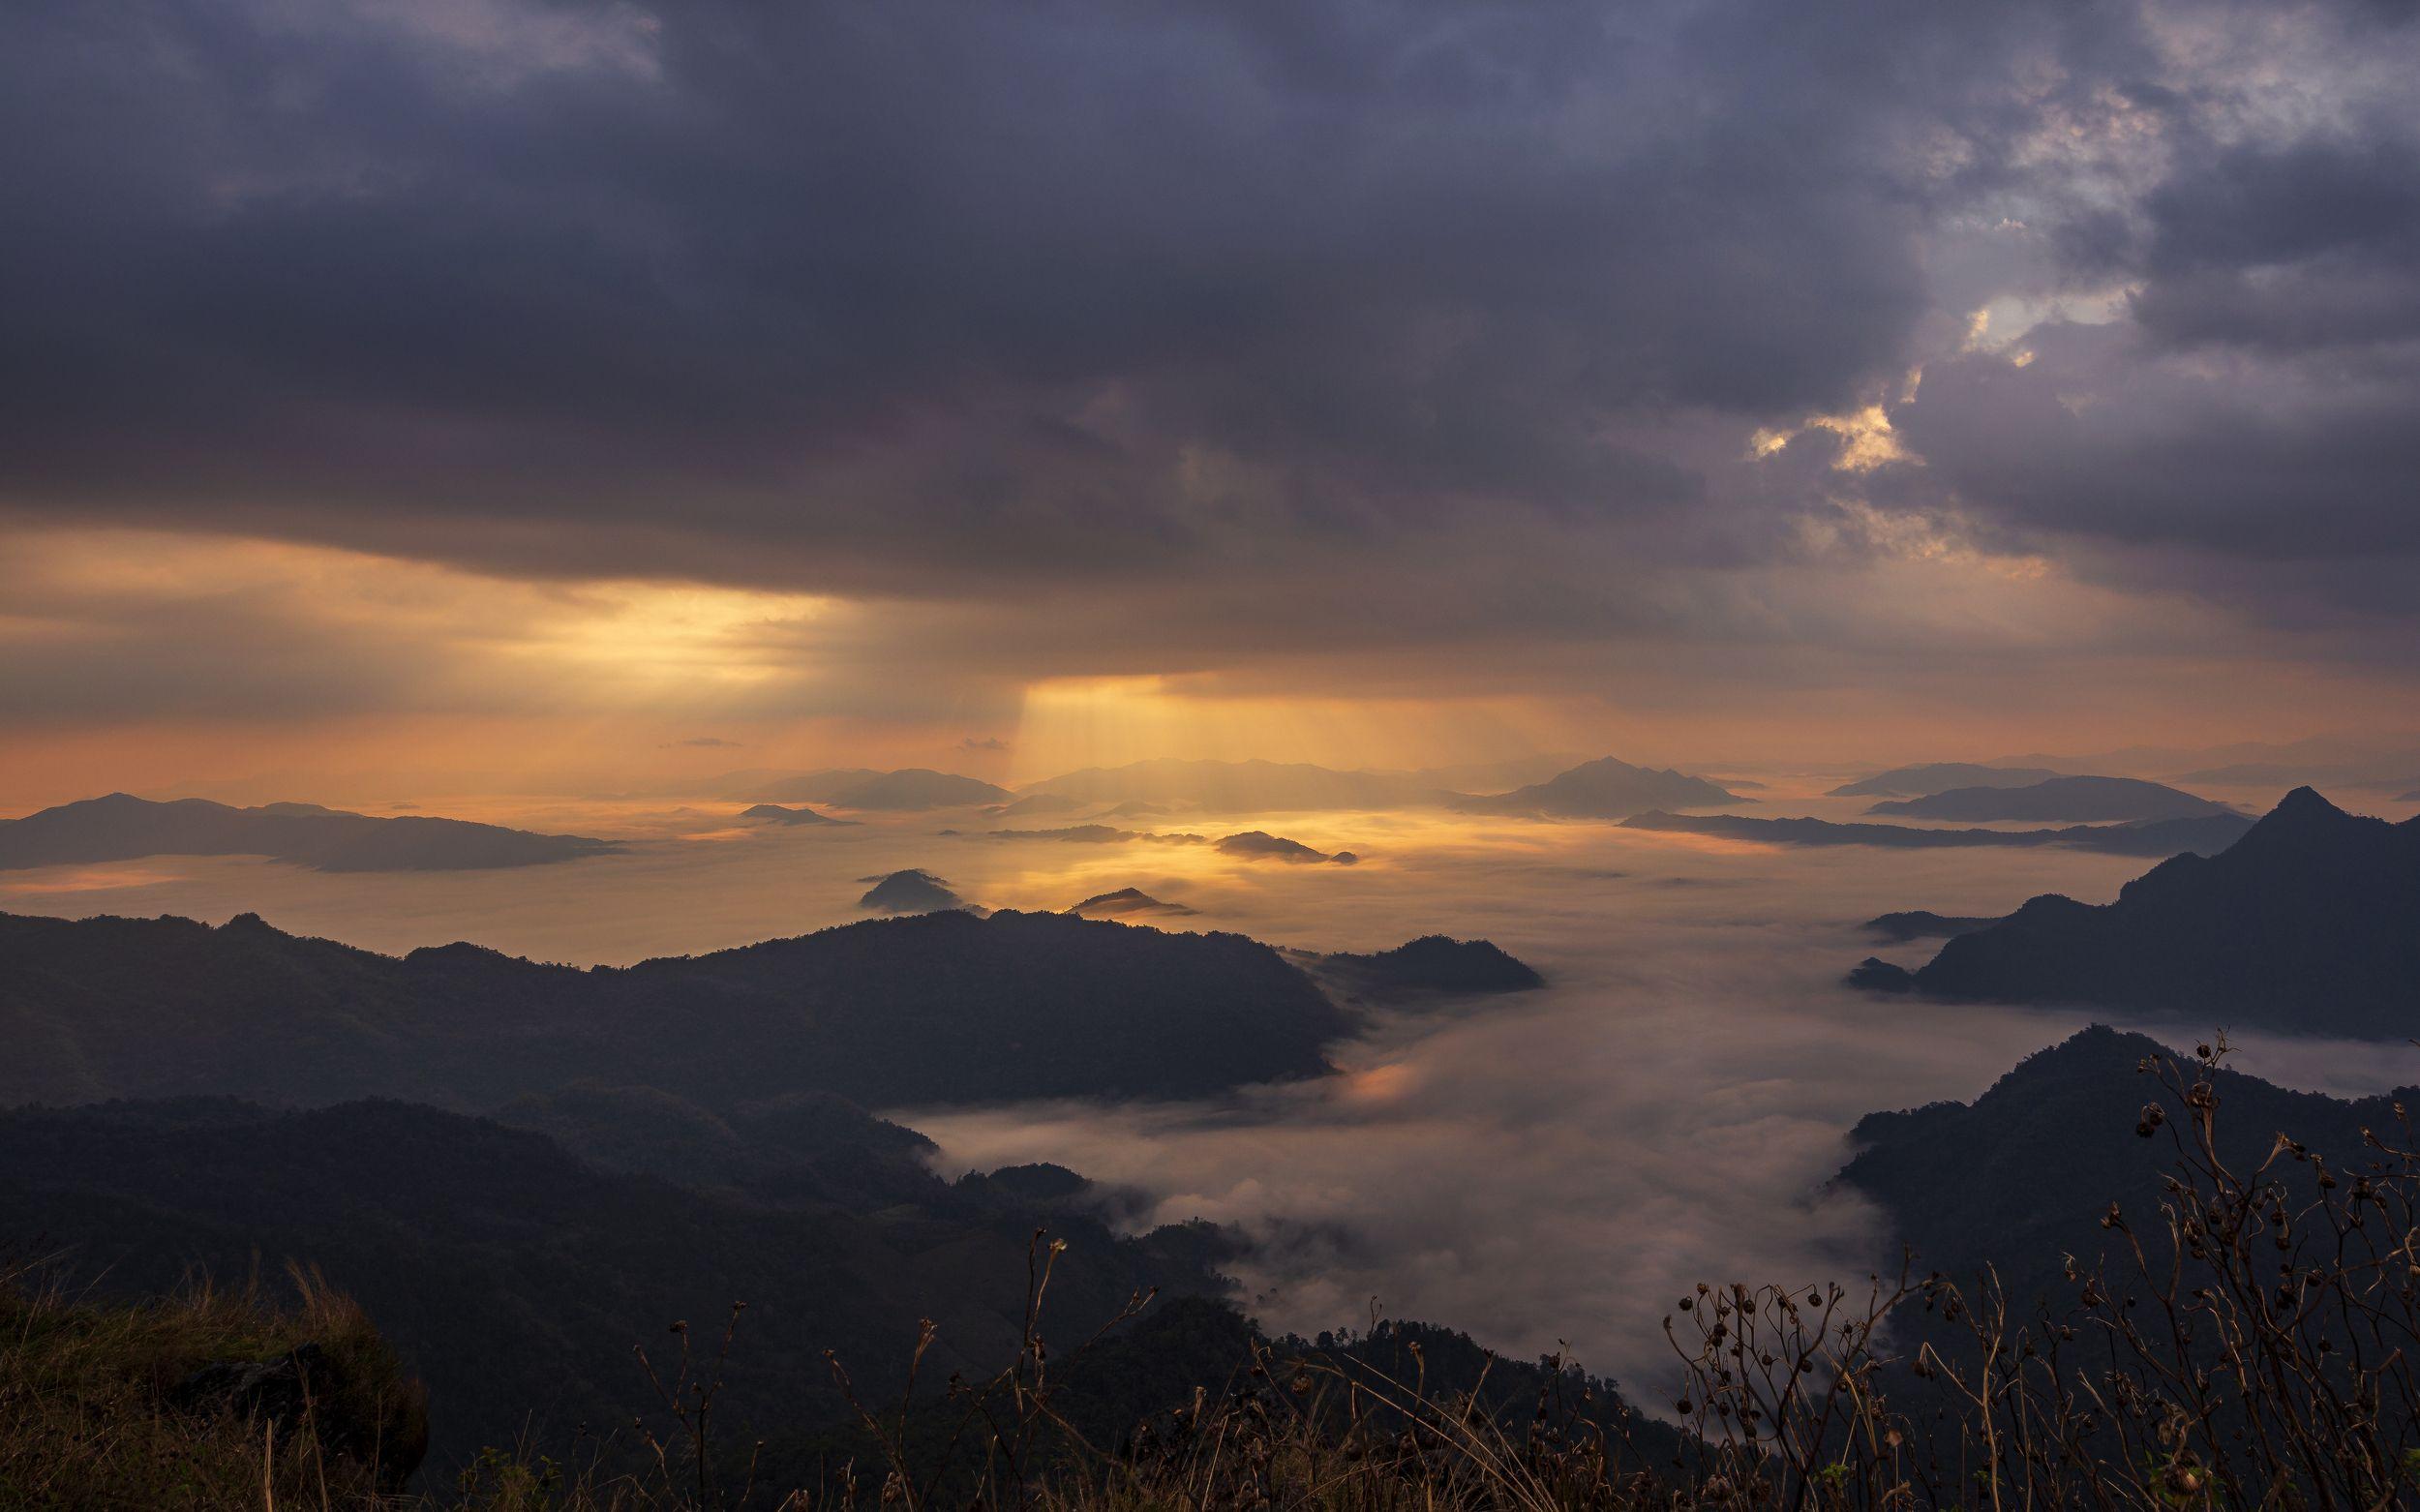 пейзаж, таиланд, пху чи фа, landscape, thailand, mountains, Токарев Олег